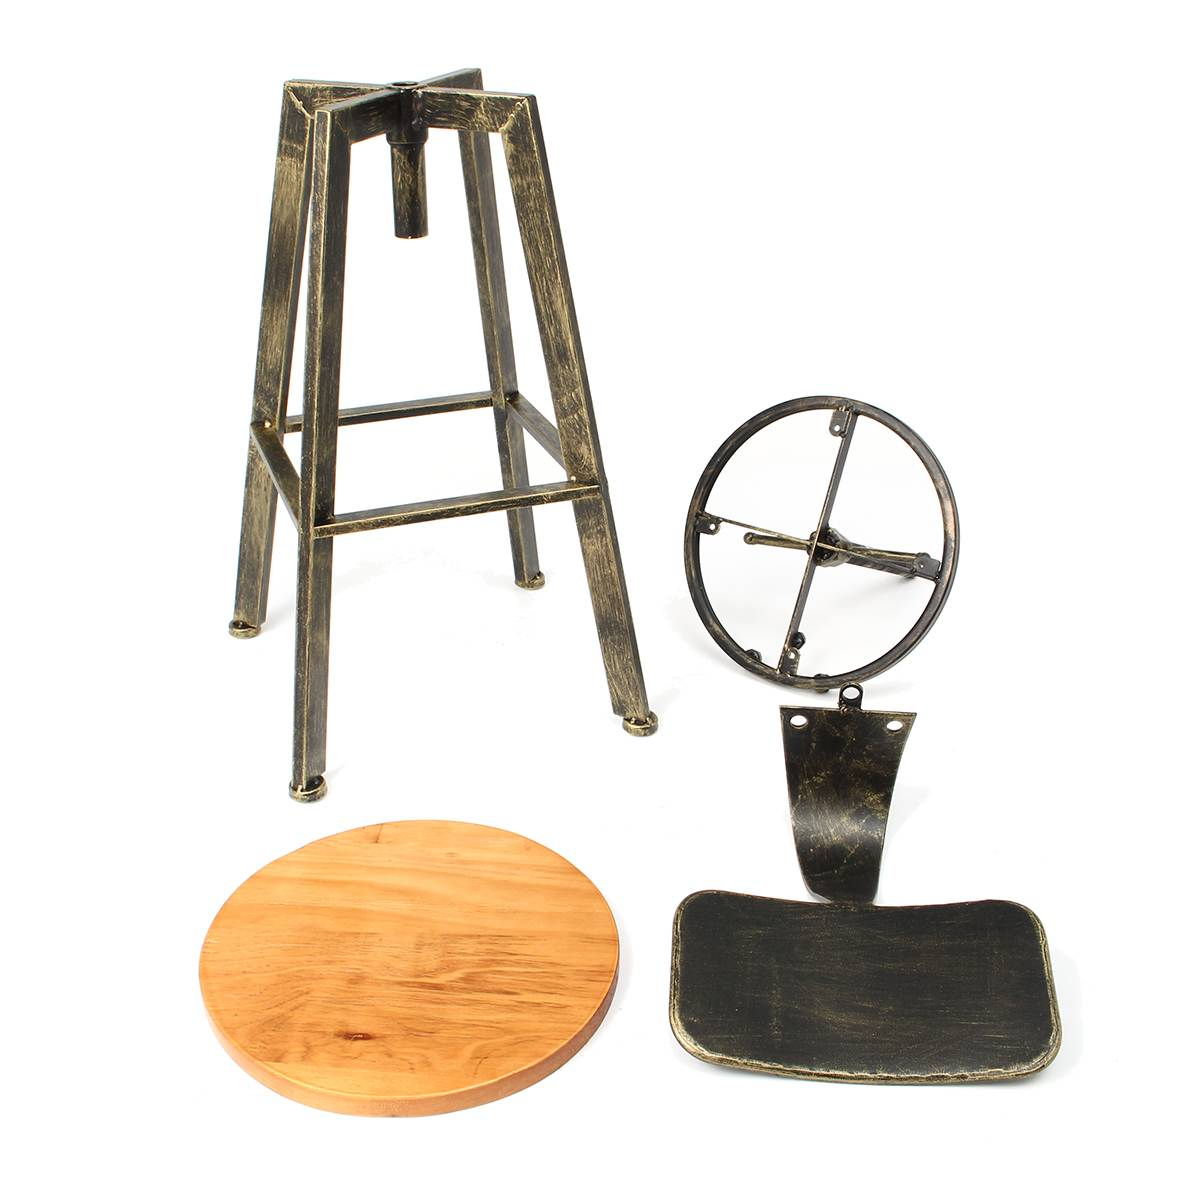 Fantastic Retro Industrial Bar Chair Stool Adjustable Wood Iron Stool 360 Degree Rotating Counter Lift High Chair Home Bar Decor 3 Colors Inzonedesignstudio Interior Chair Design Inzonedesignstudiocom